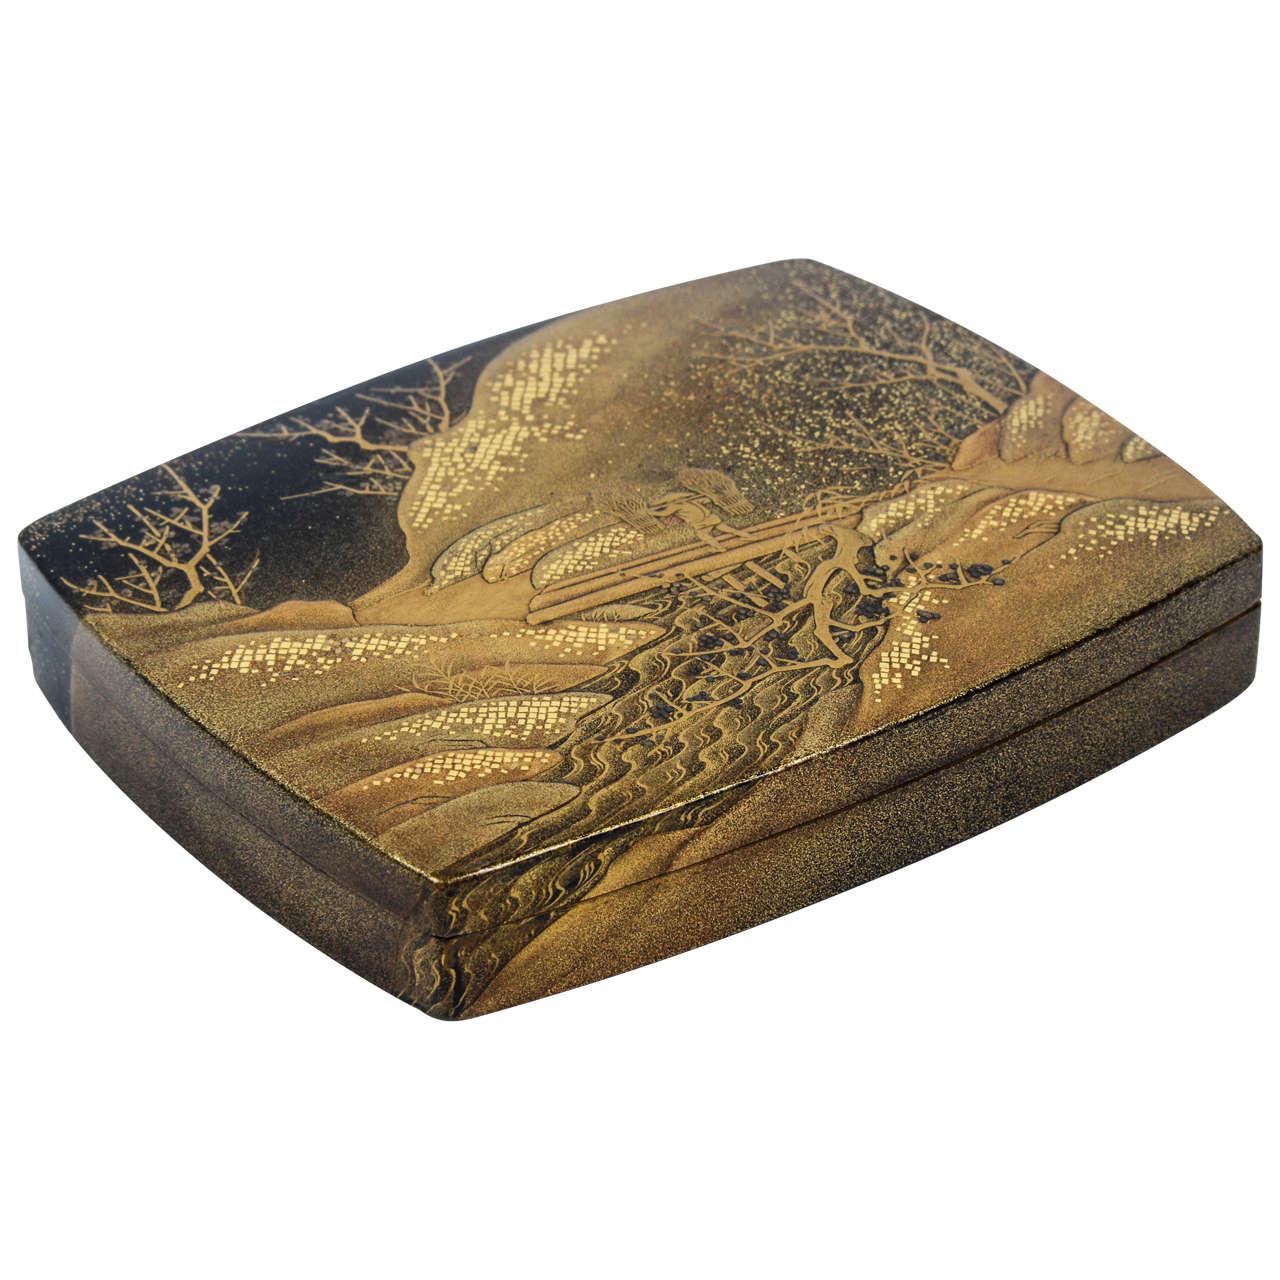 18th Century Gold Lacquered Japanese Kobako Box At 1stdibs